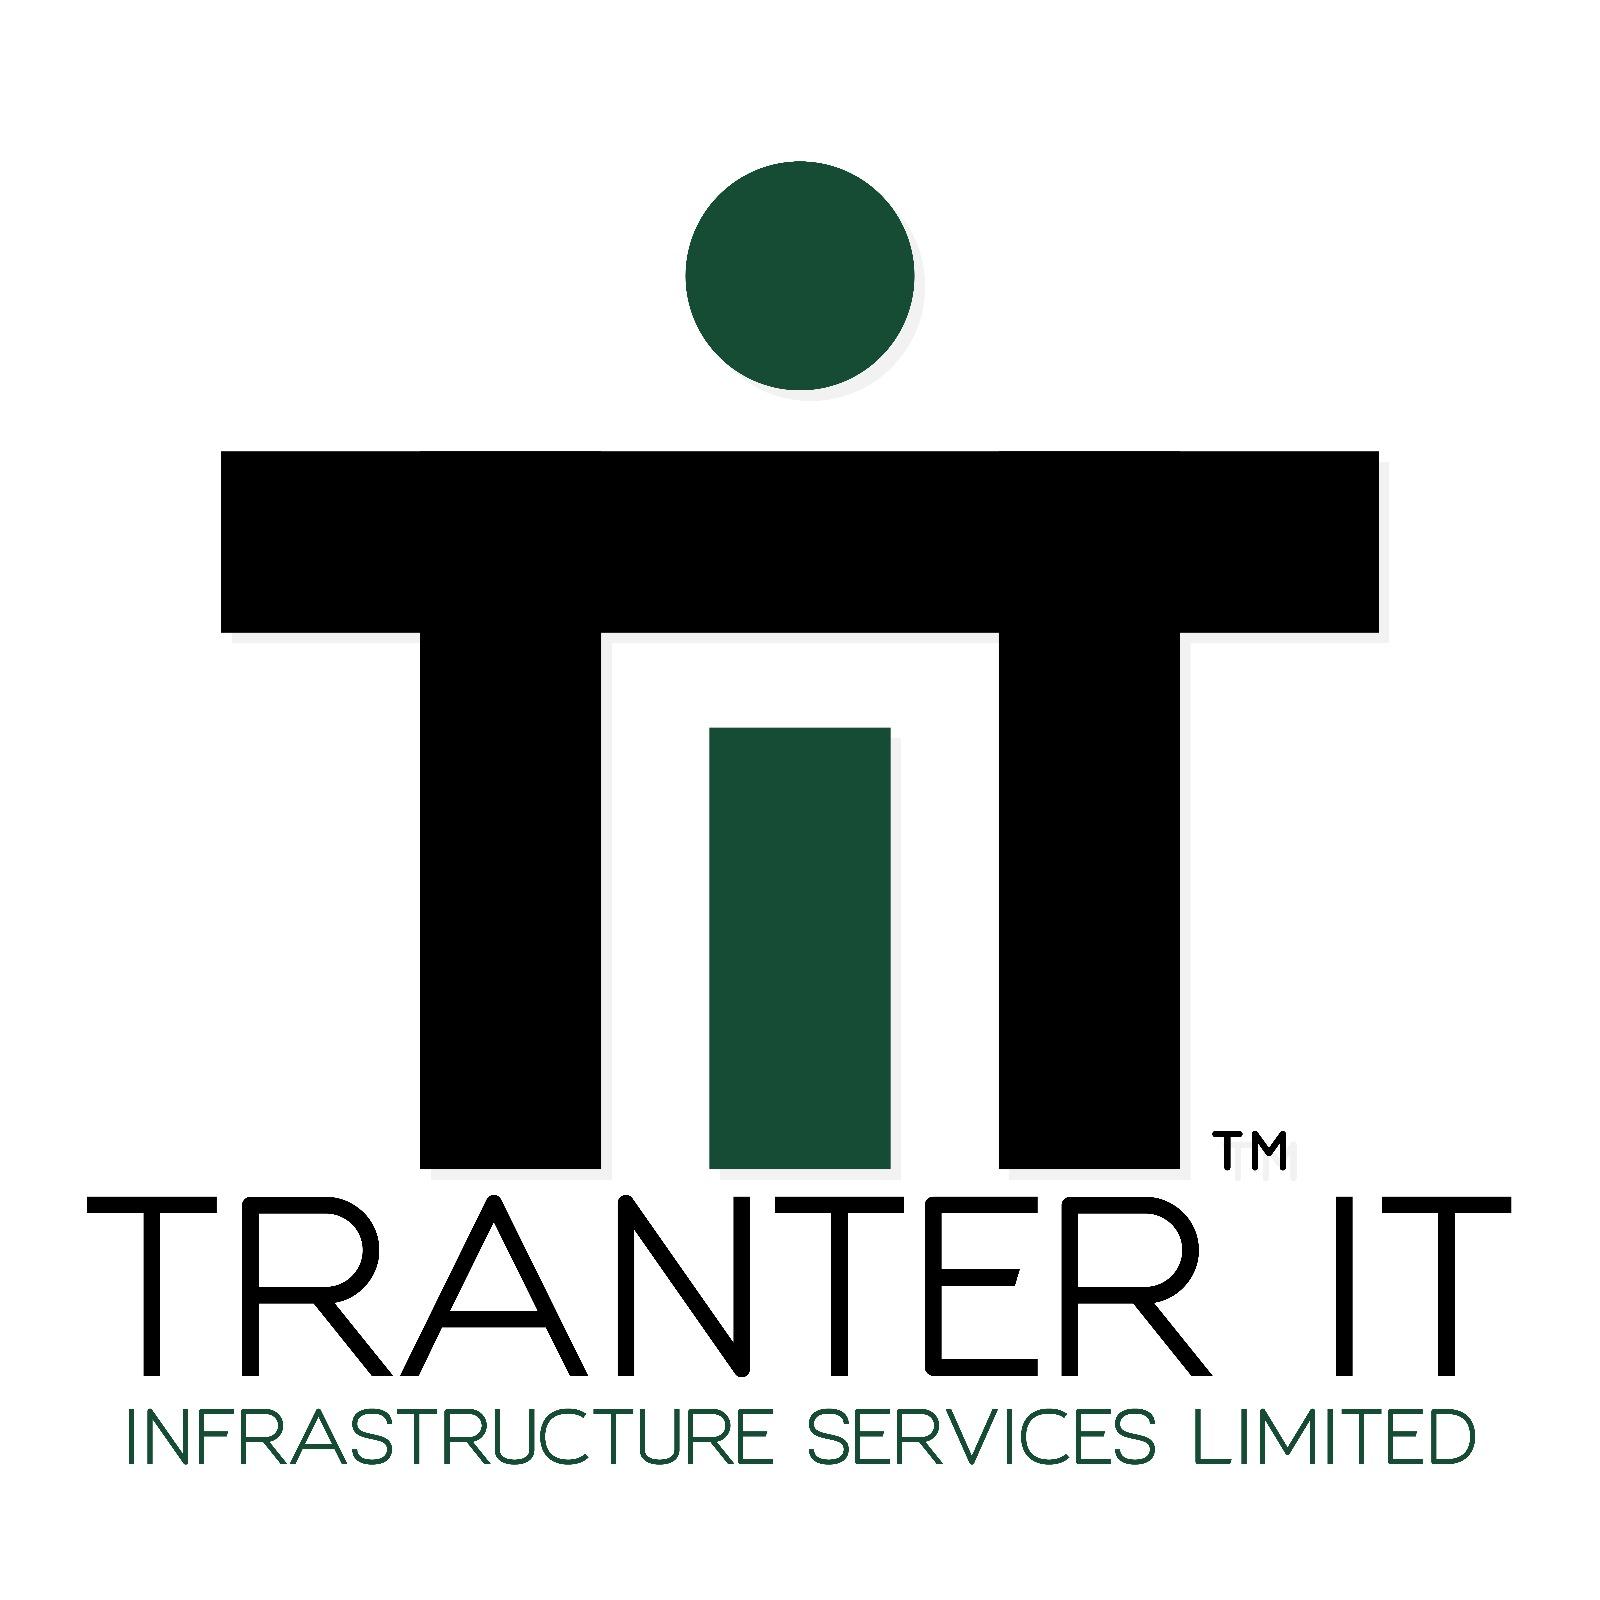 Tranter it infrastructure services limited Пластинчатый разборный теплообменник SWEP GL-205P Волгодонск